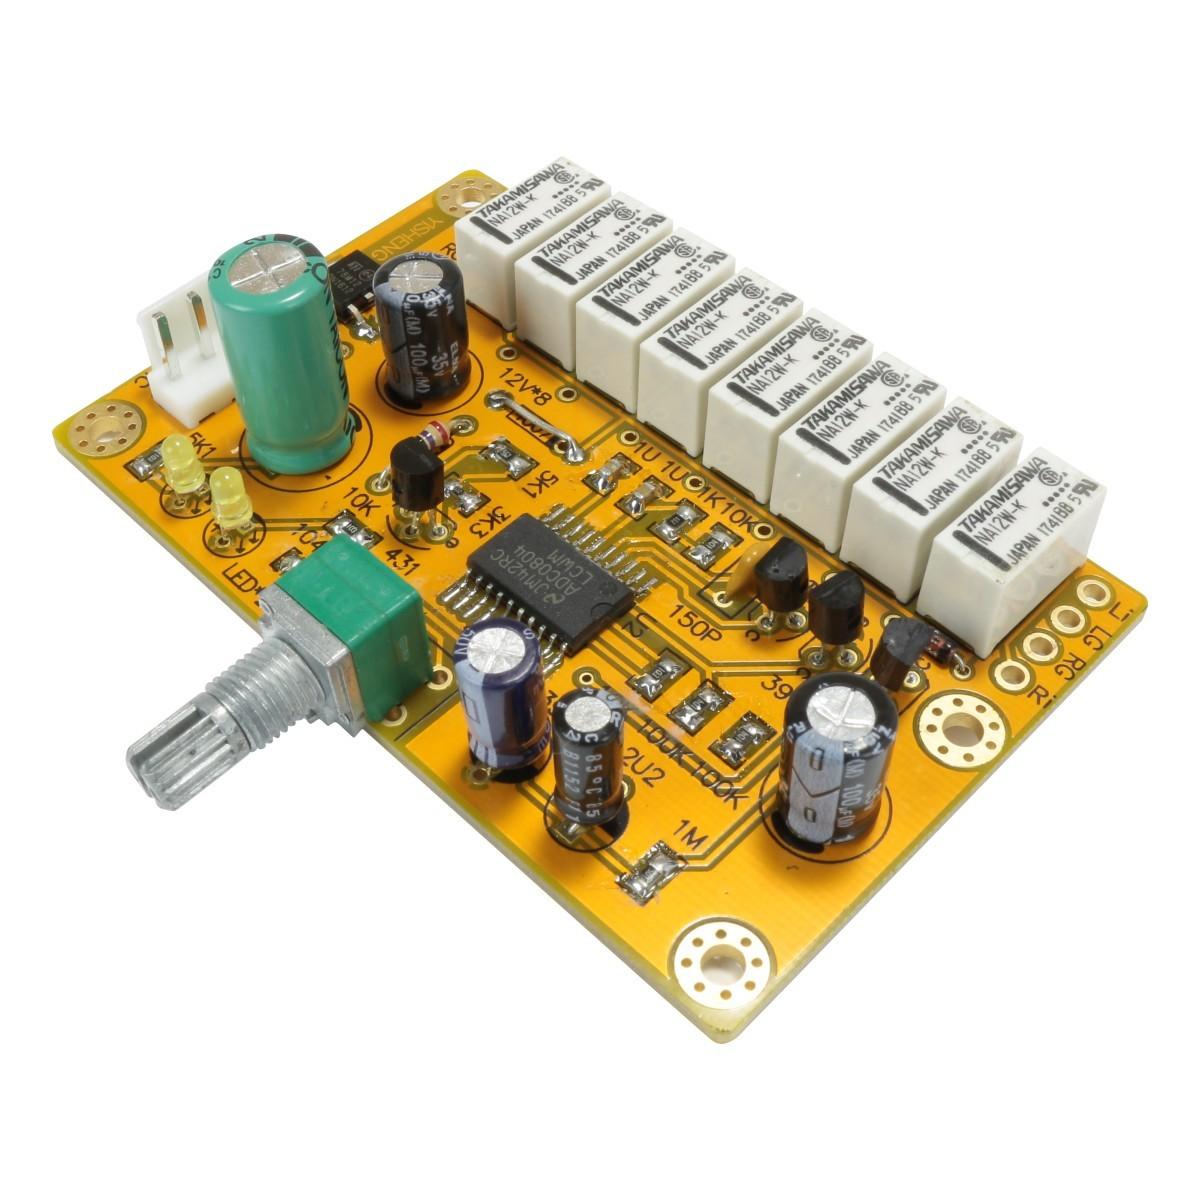 Passive Audio ladder volume controler 8bit 256 levels by logic door